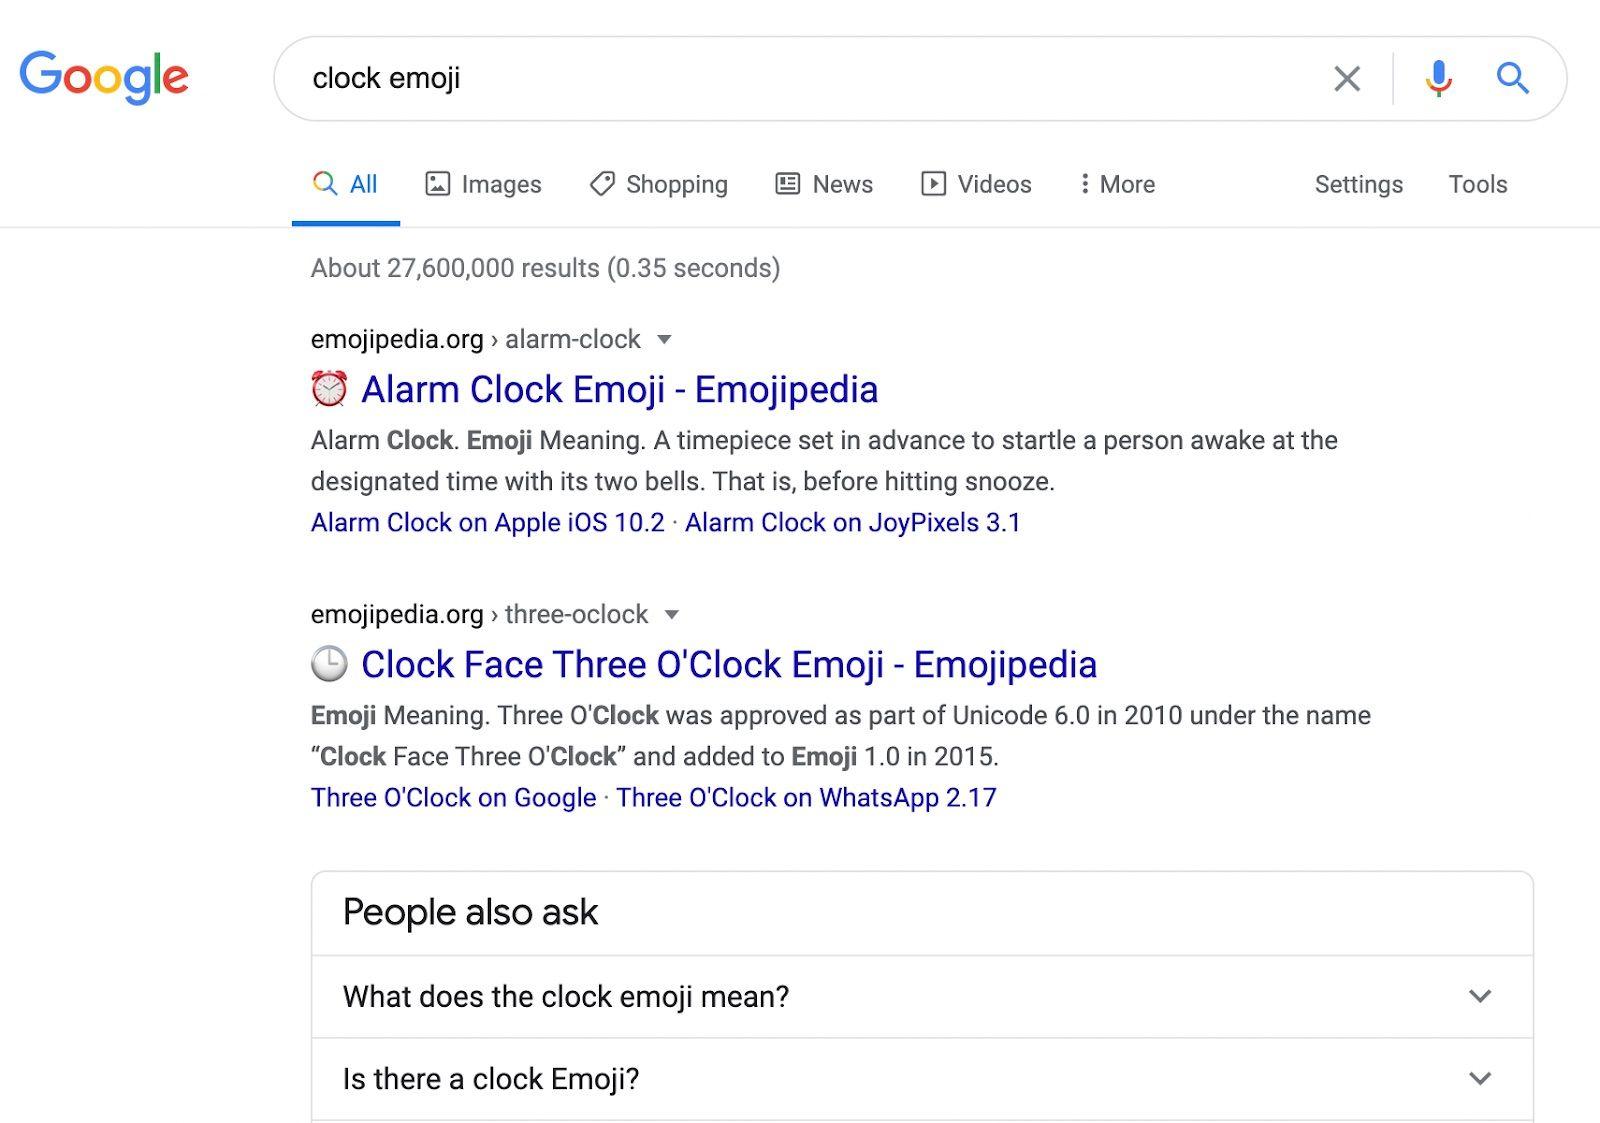 clock-emoji-google-search-2021-emojipedia